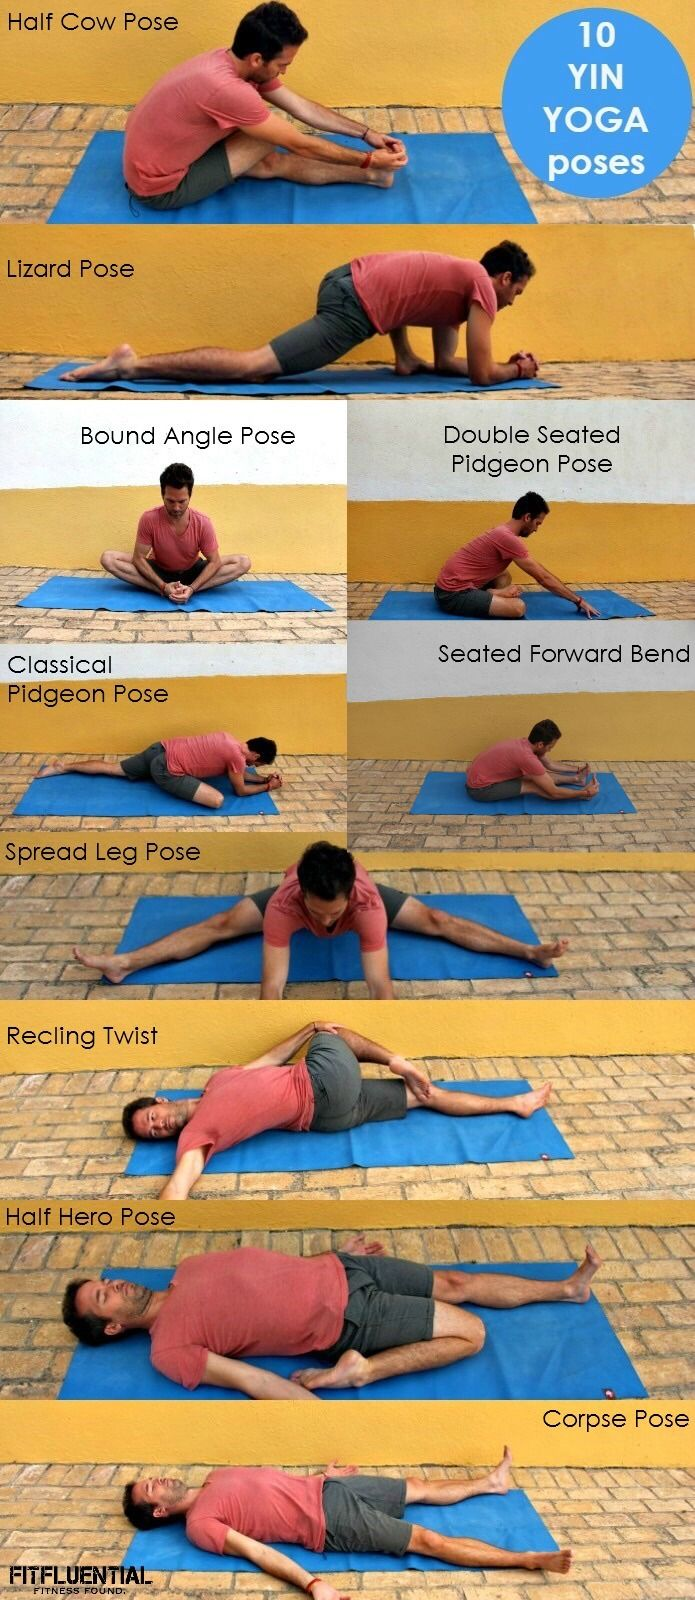 Restorative YIN Yoga poses from the Ultimate Yogi, Travis Eliot